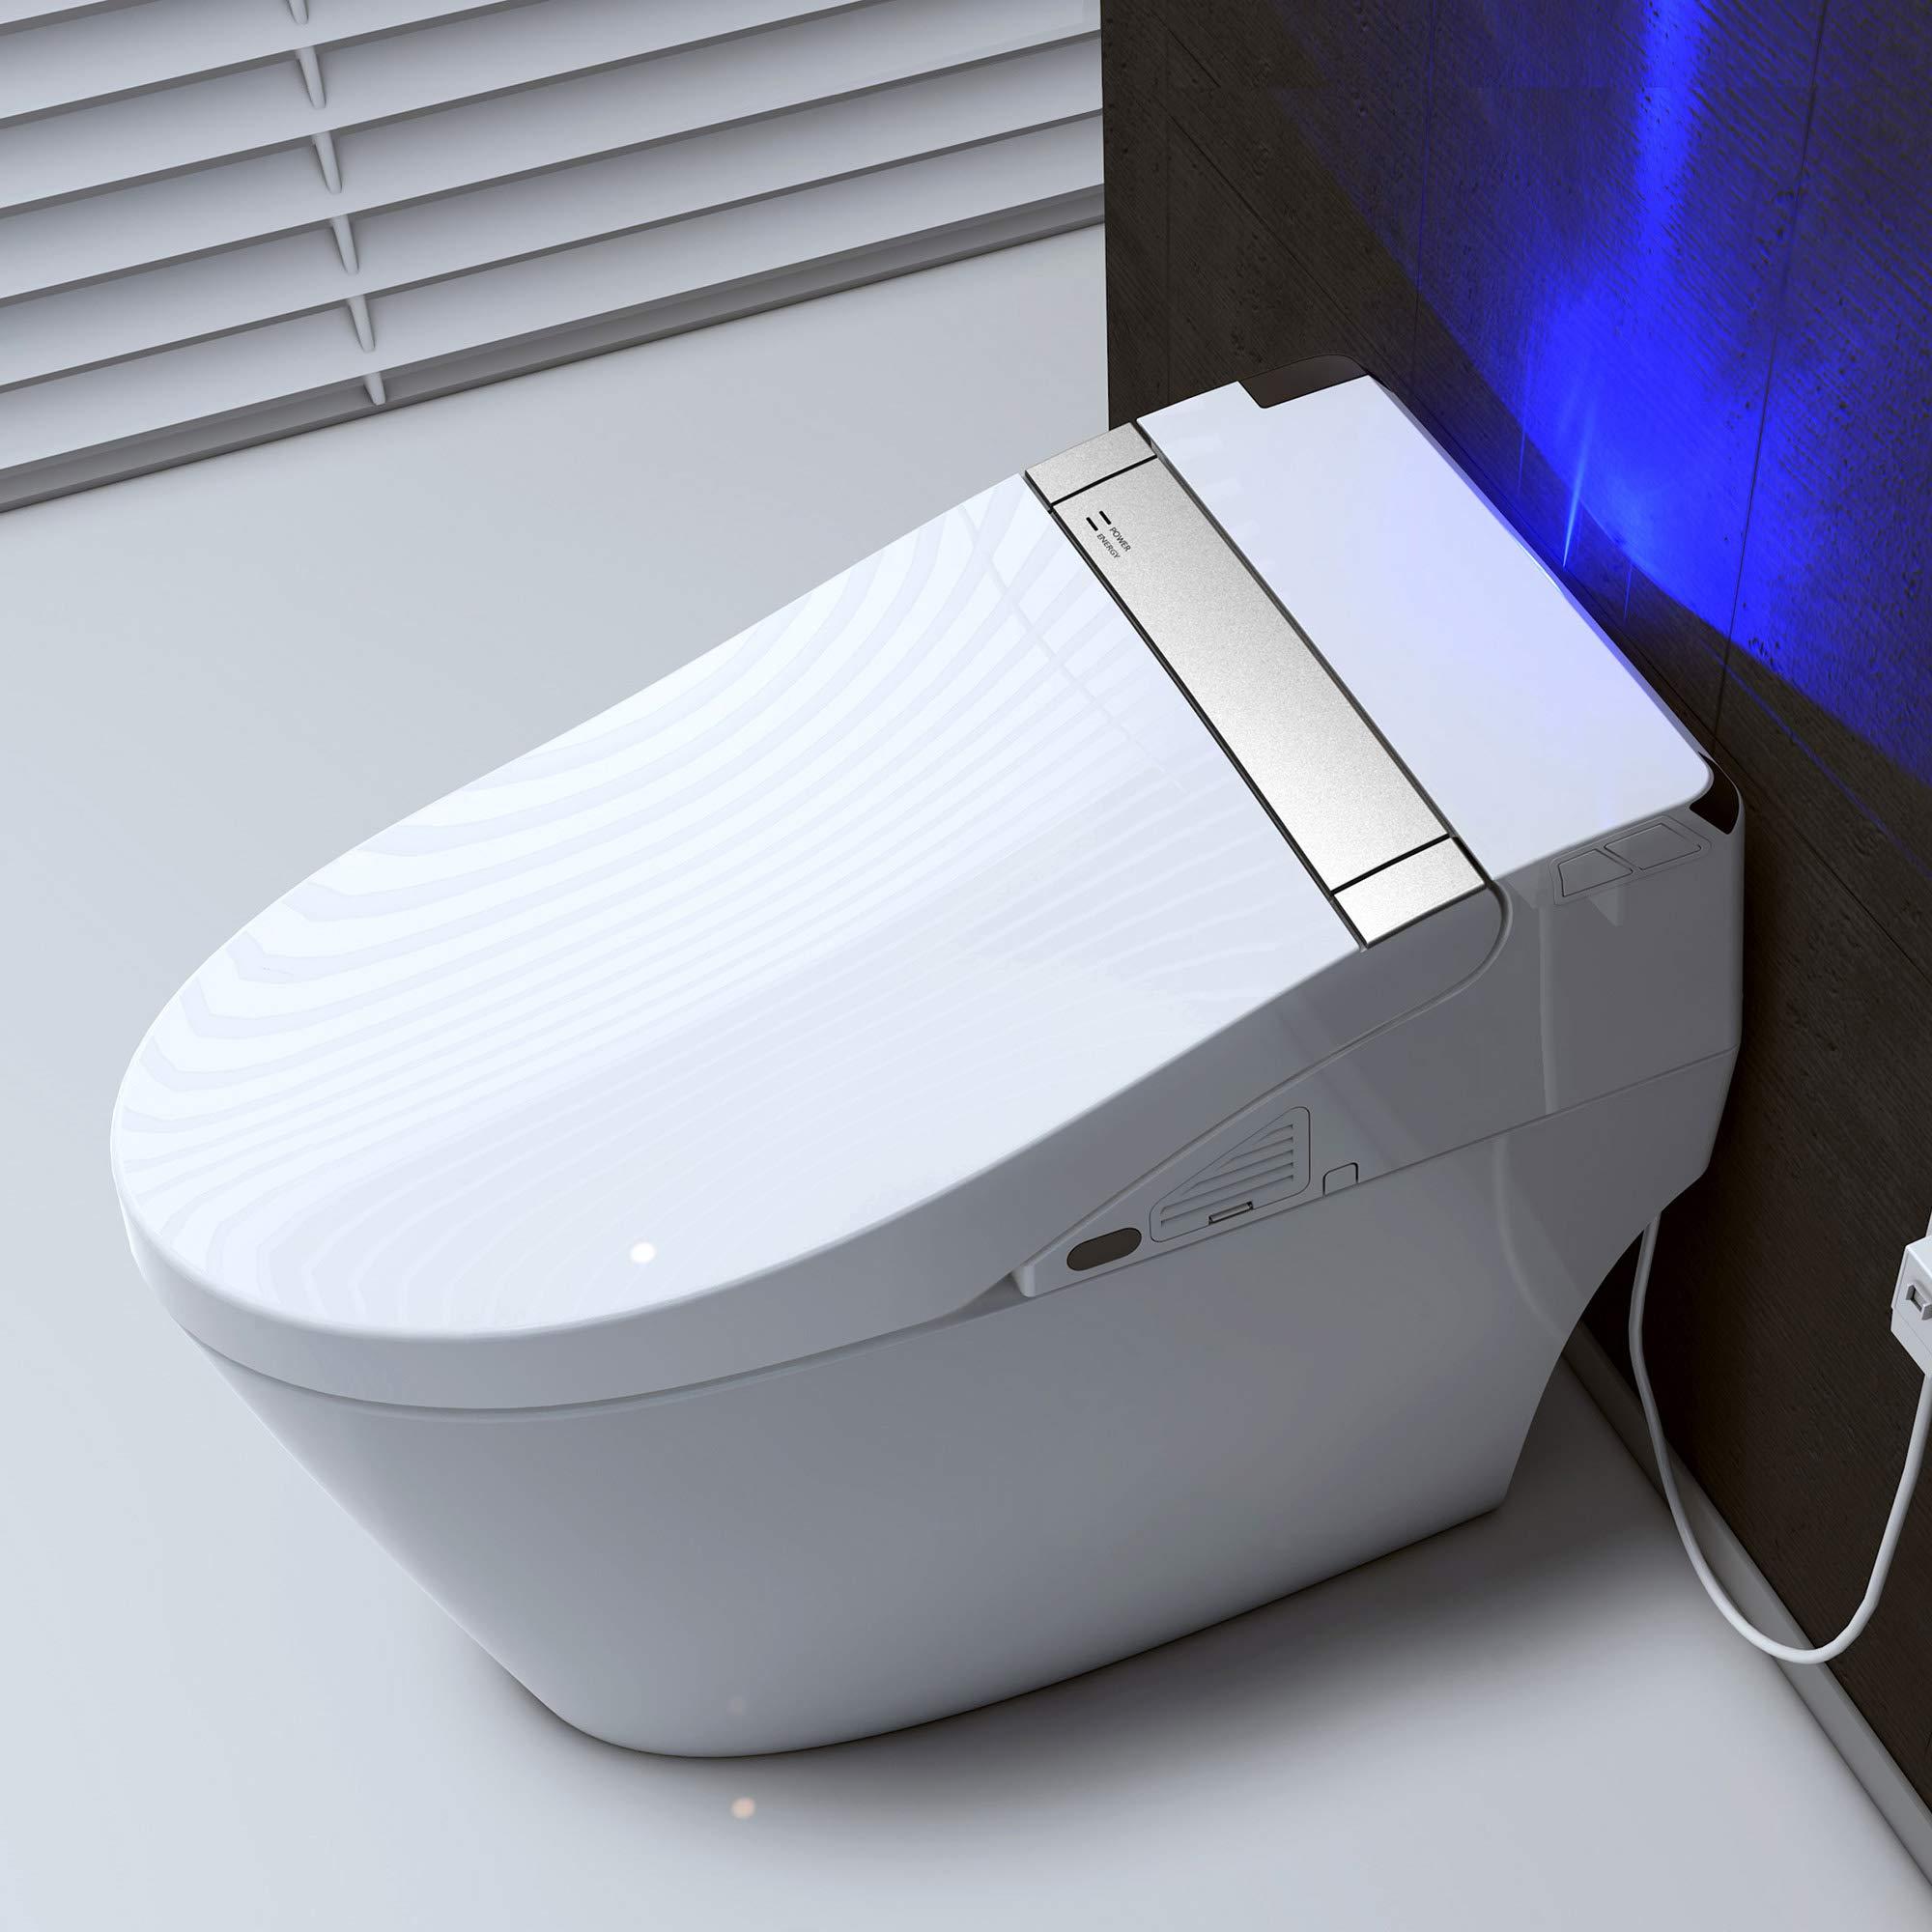 WOODBRIDGE B0960S White Elongated One Piece Toilet with Advance Bidet and Soft Closing Seat, Dual Flush 1.0/1.6 GPF